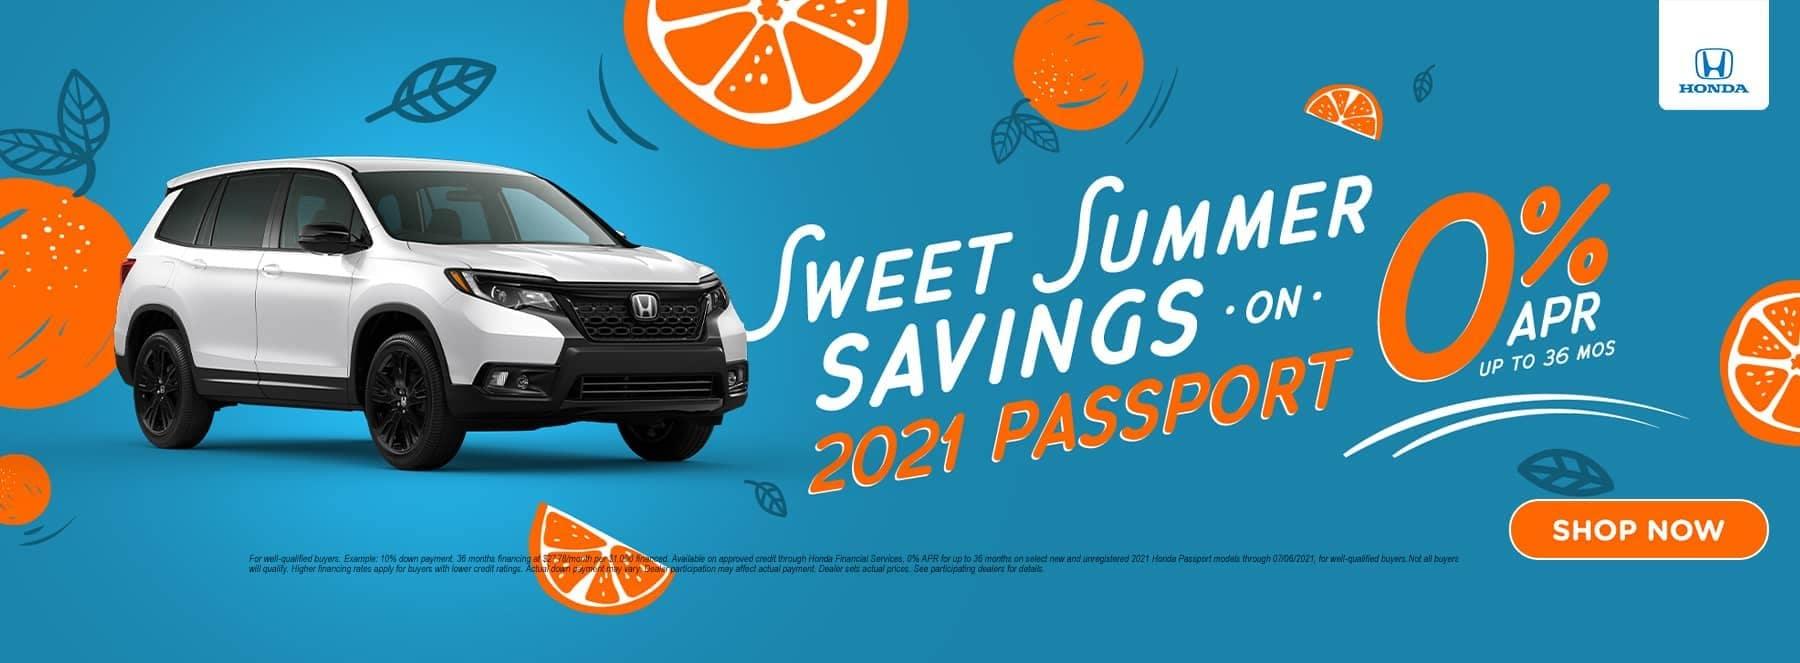 Sweet Summer Savings 2021 Passport